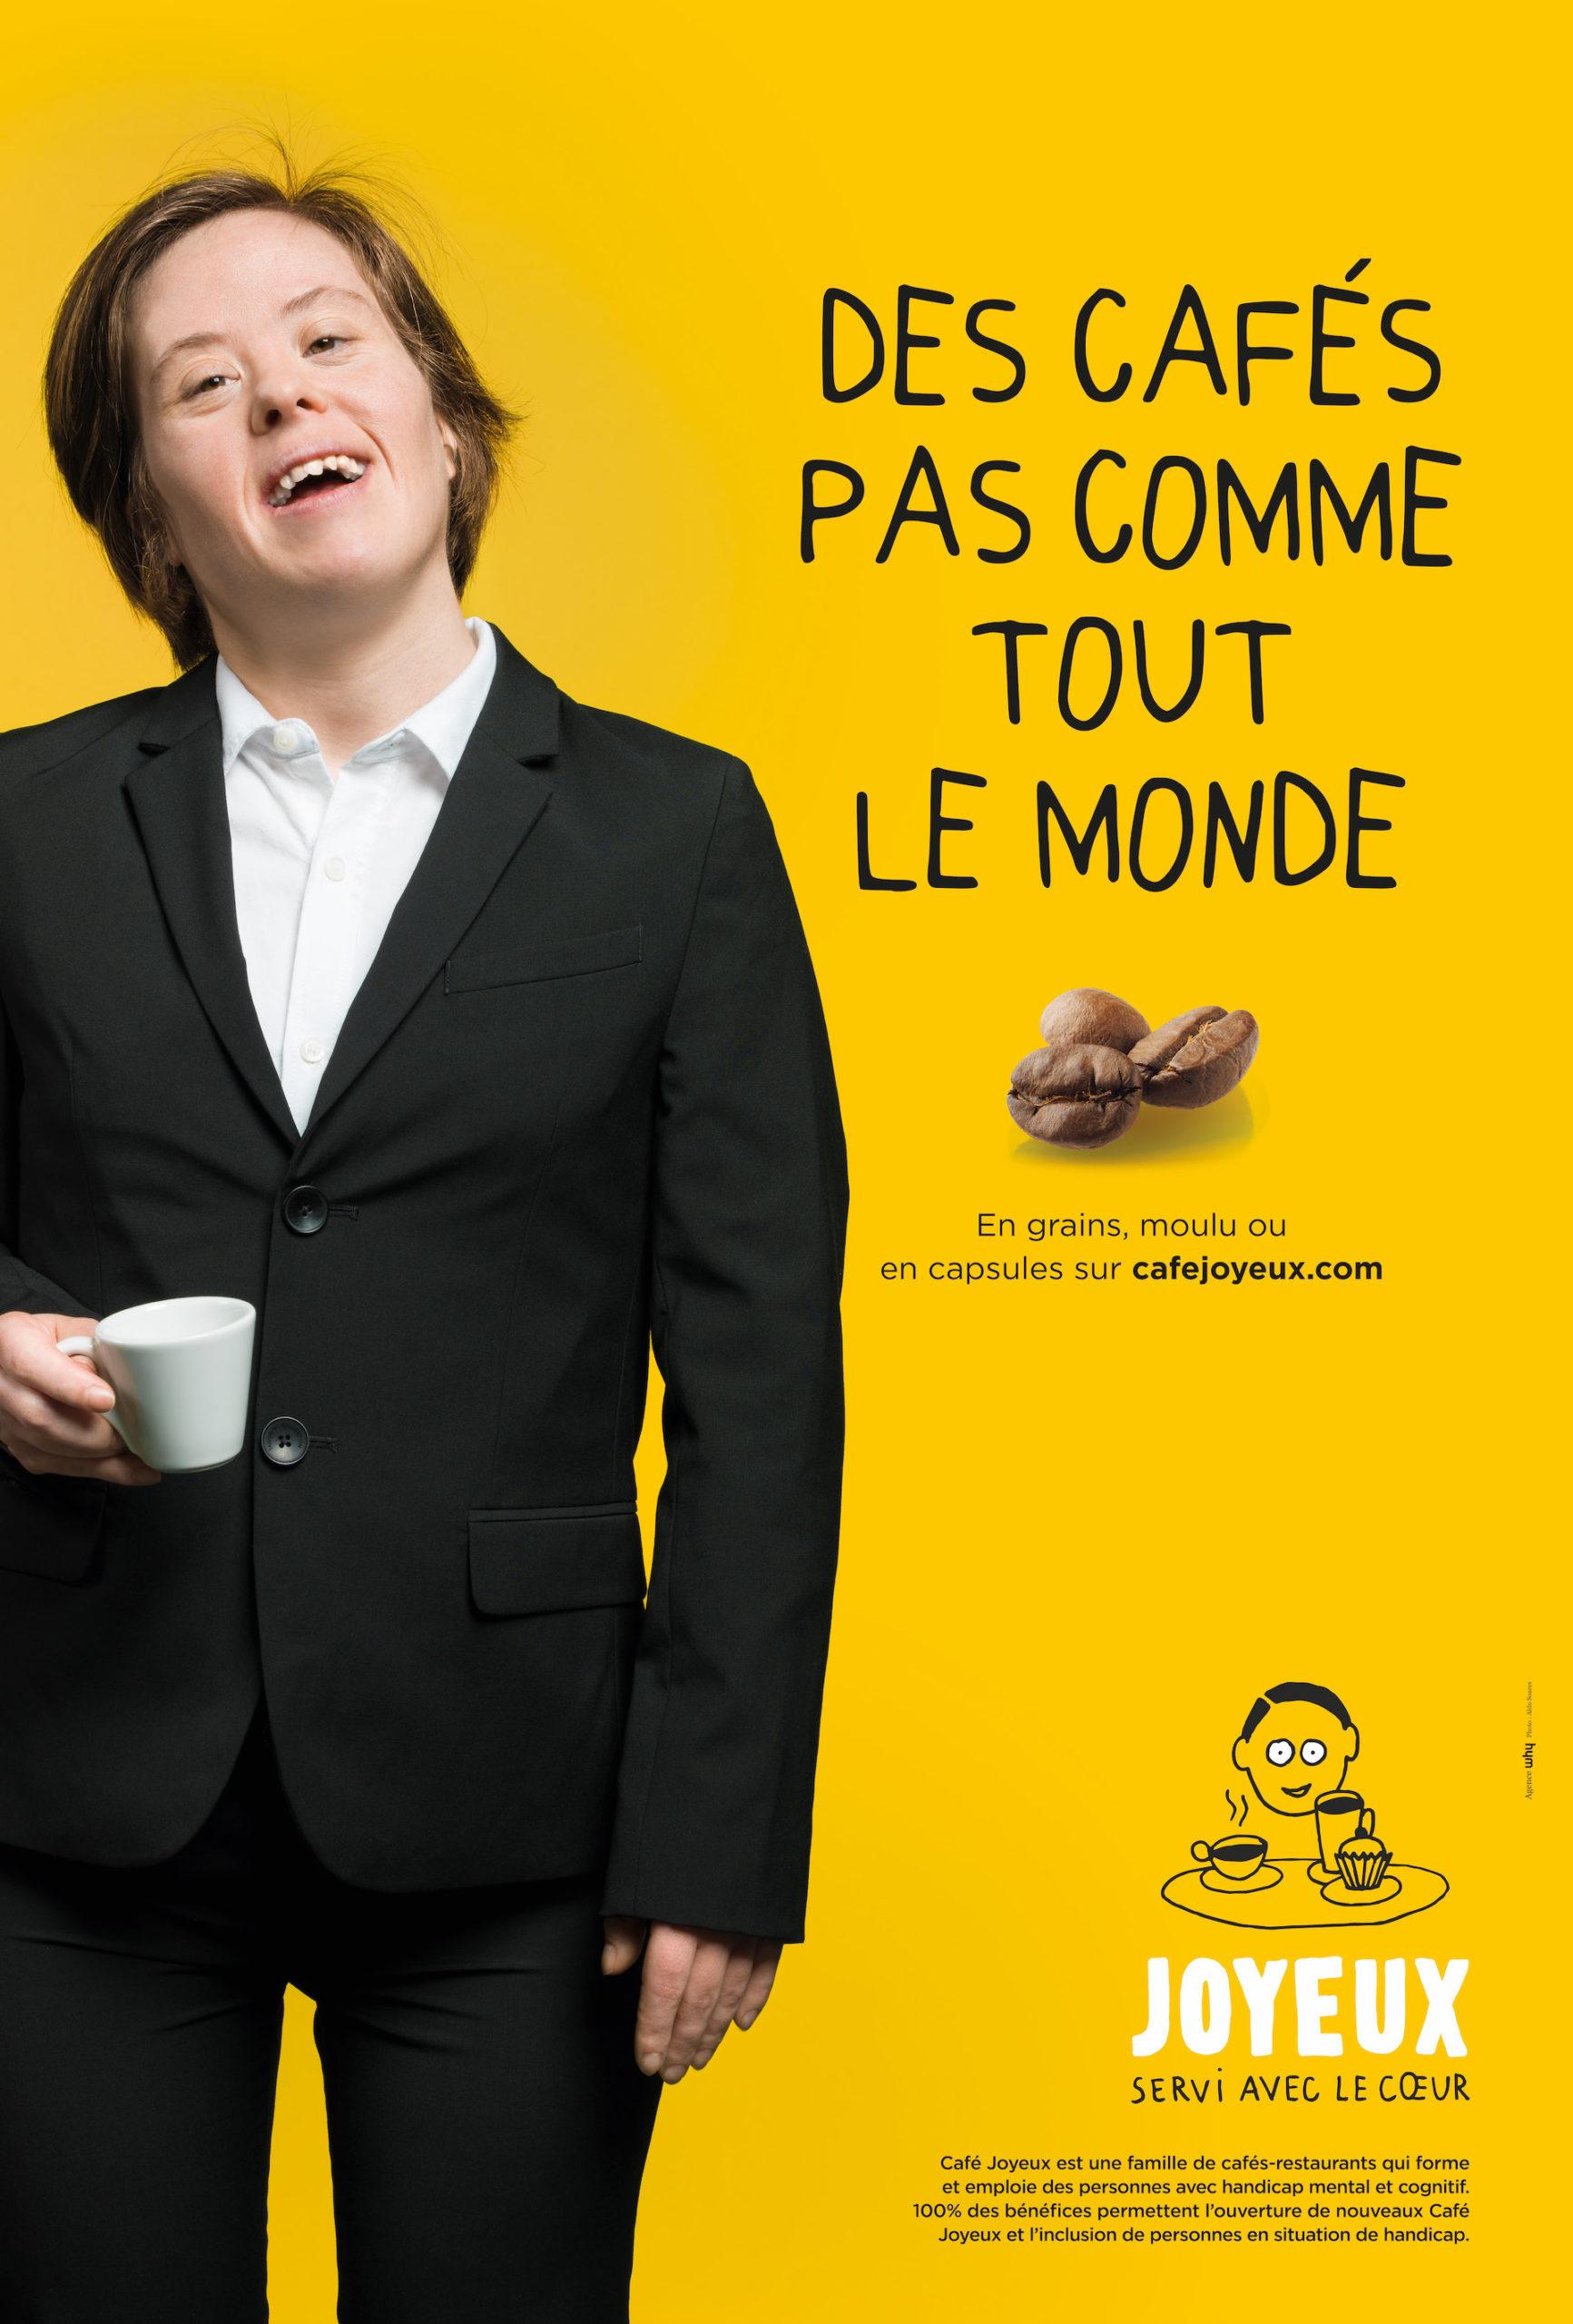 CAFEJOYEUX_AFFICHES_CAFES_2m2_FEV_2020_3